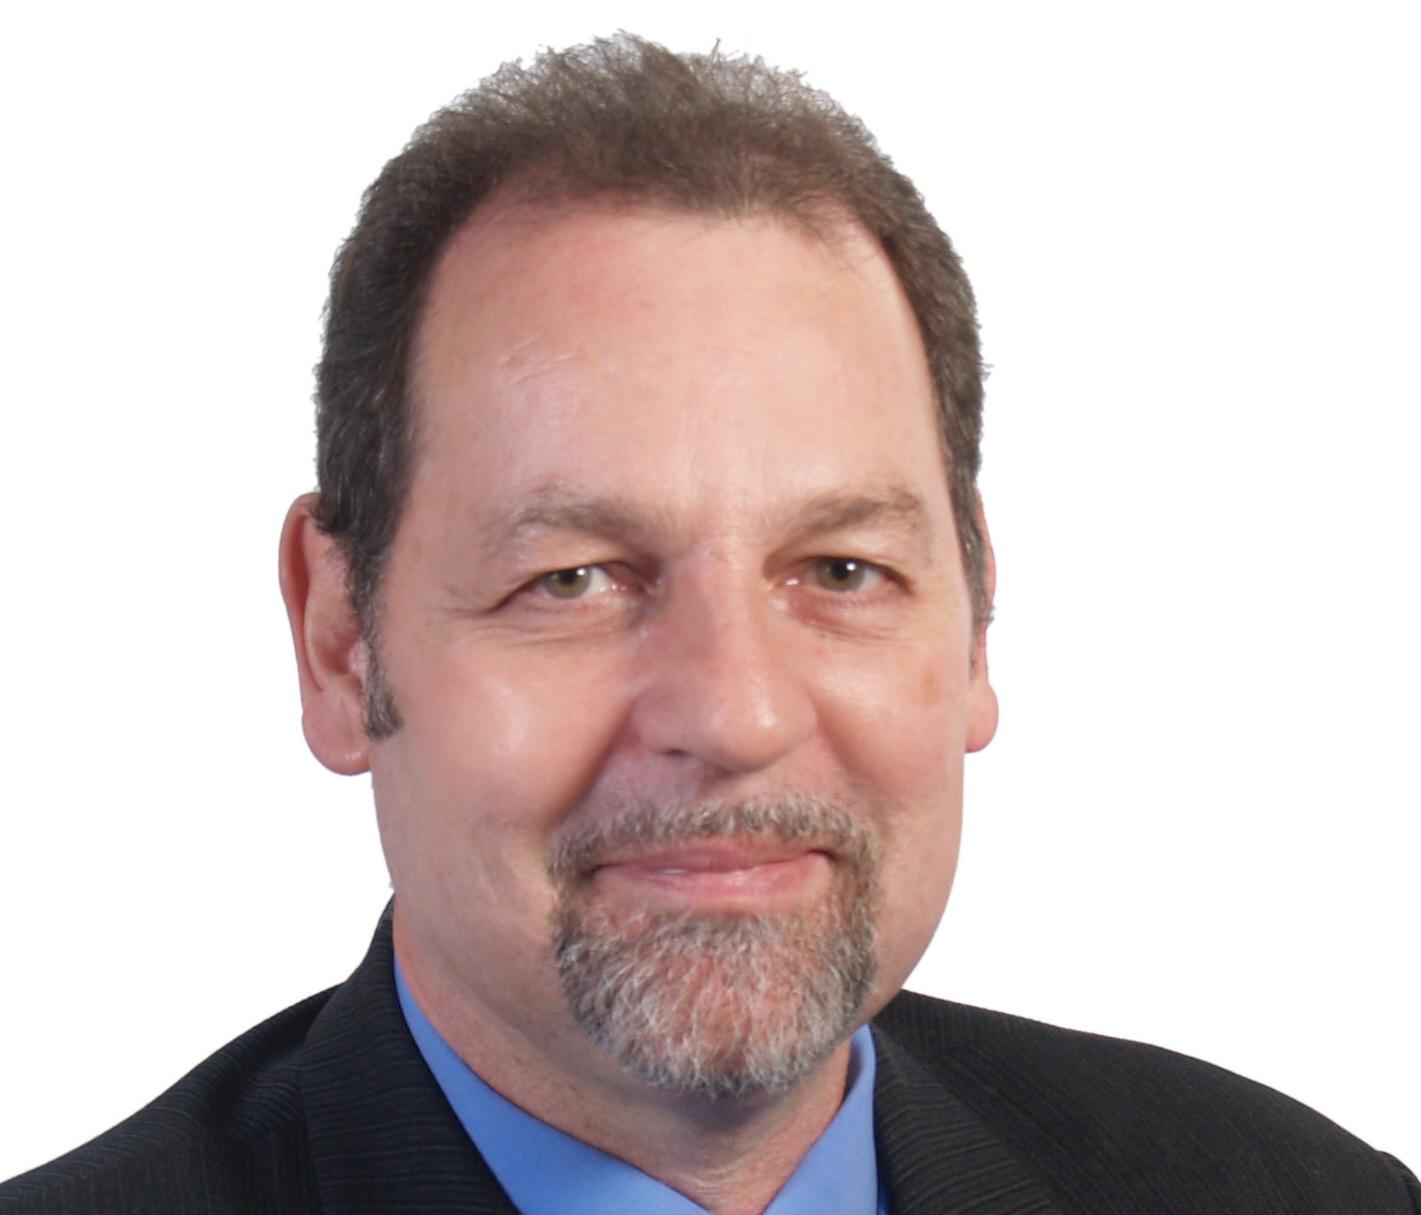 John Mullinder, Executive Director